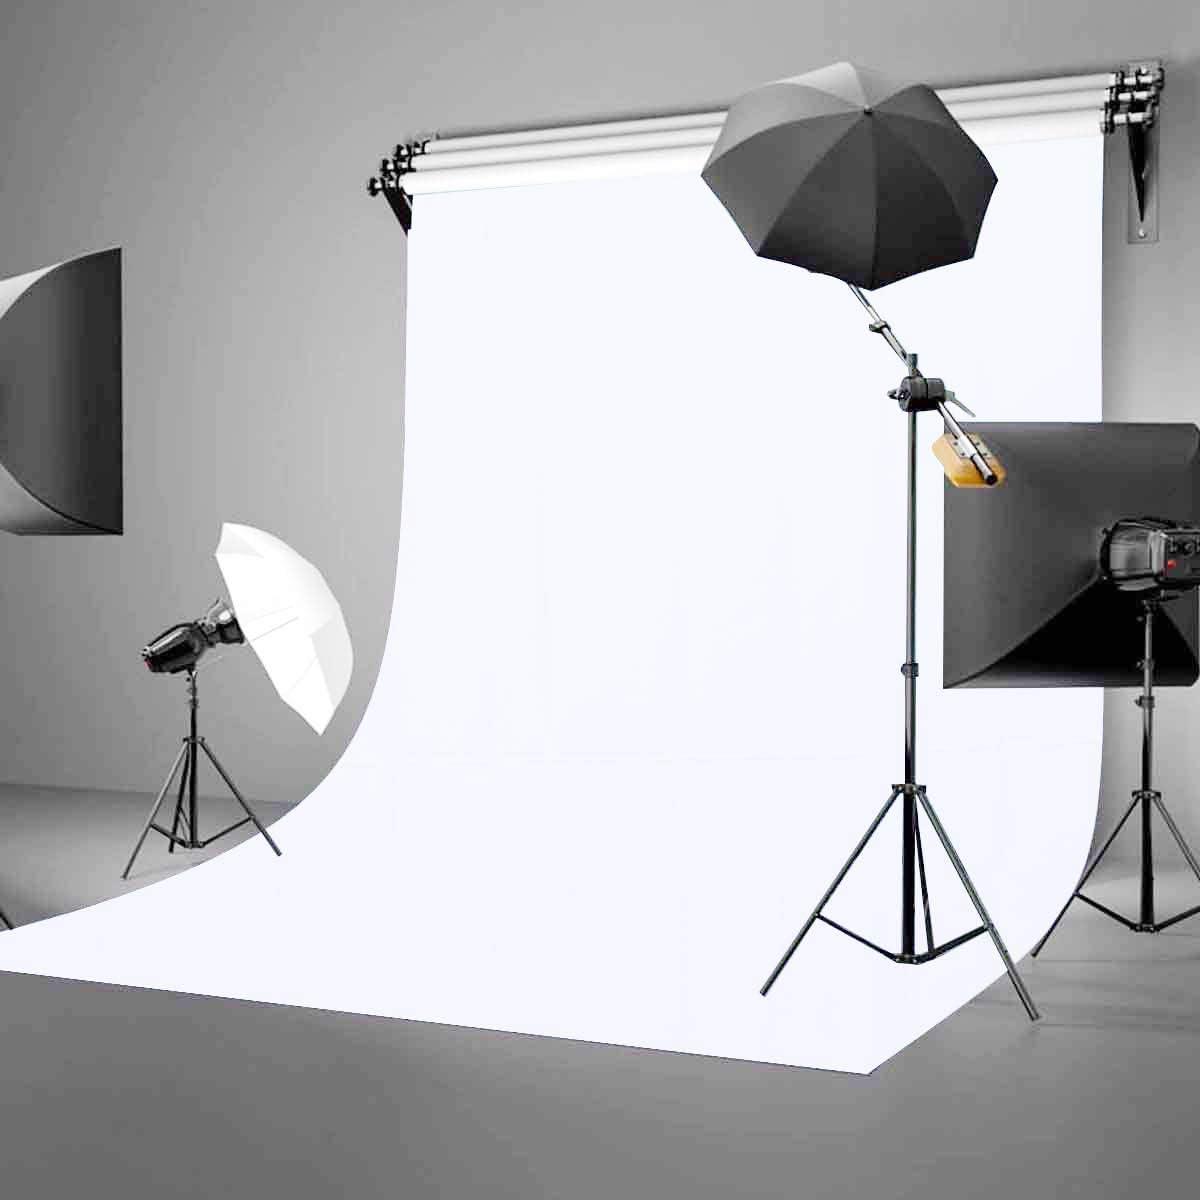 GoHeBe 5x7ft Backdrop White Screen Key Soft Pure White Studio Background ID Photo Photography Backdrop Photo Backdrops Customized Studio Photography Backdrop Background Studio Props LY164